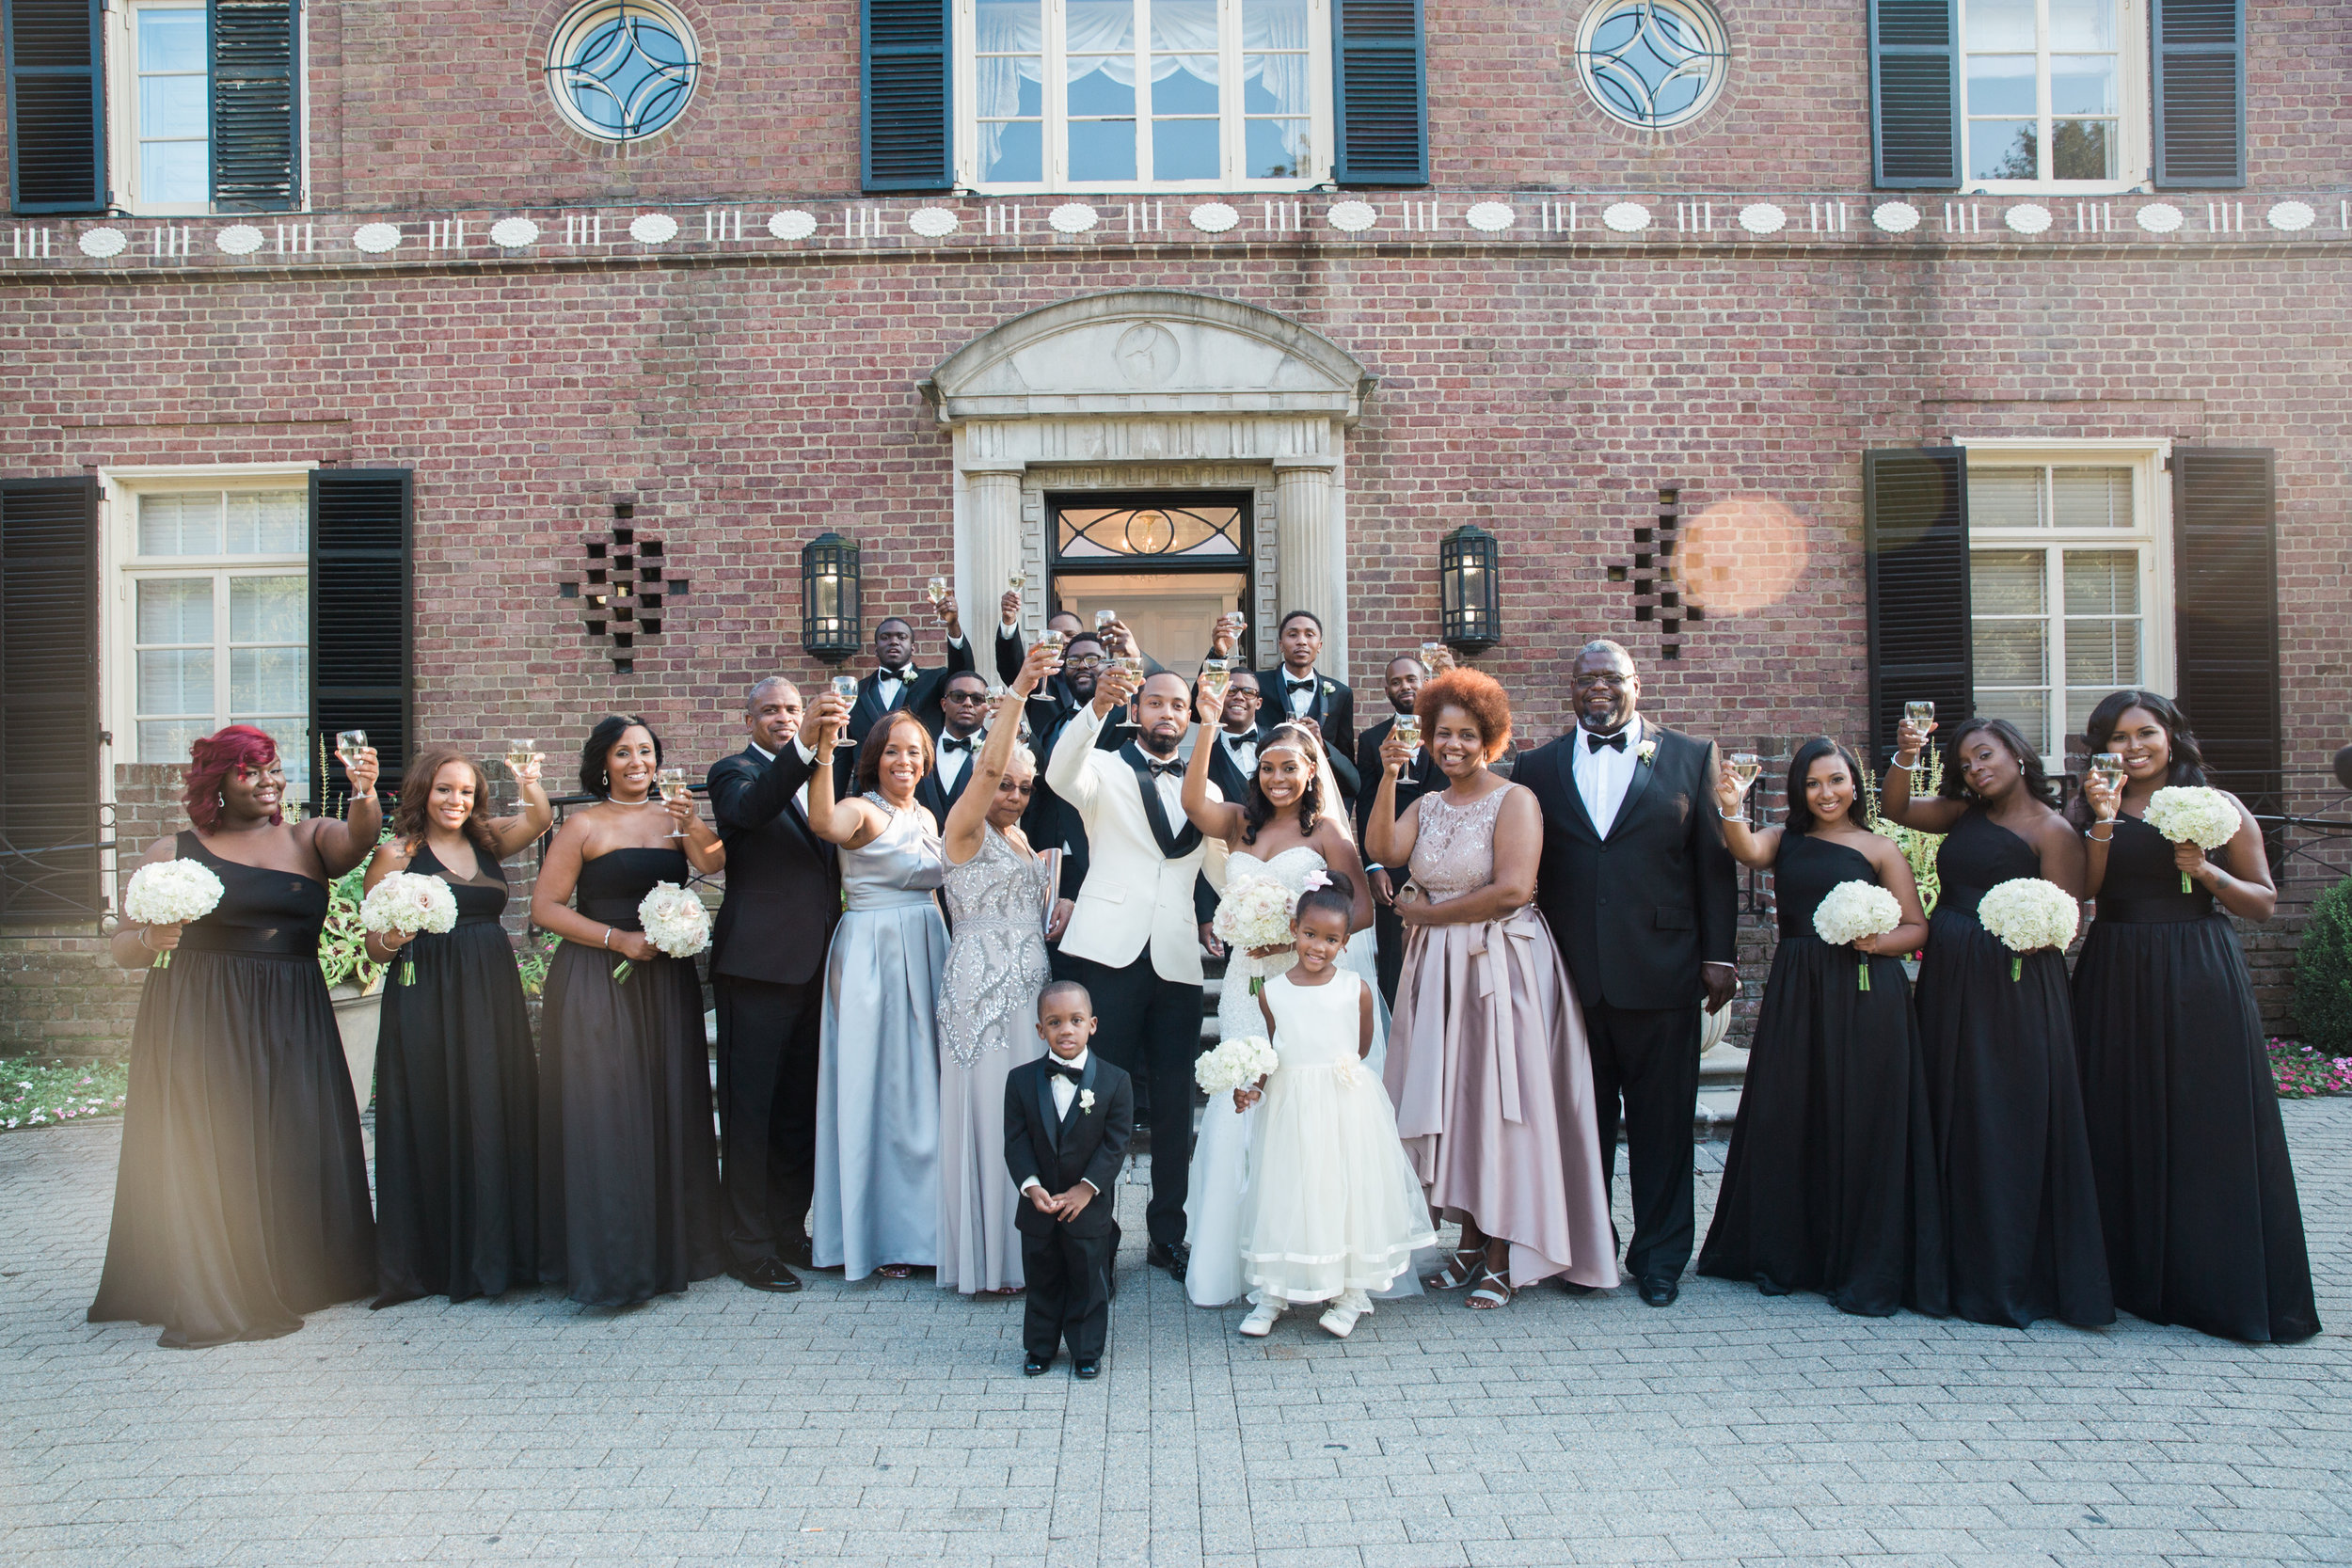 Black Wedding Photographer in Washington DC Megapixels Media black bridesmaids dresses.jpg